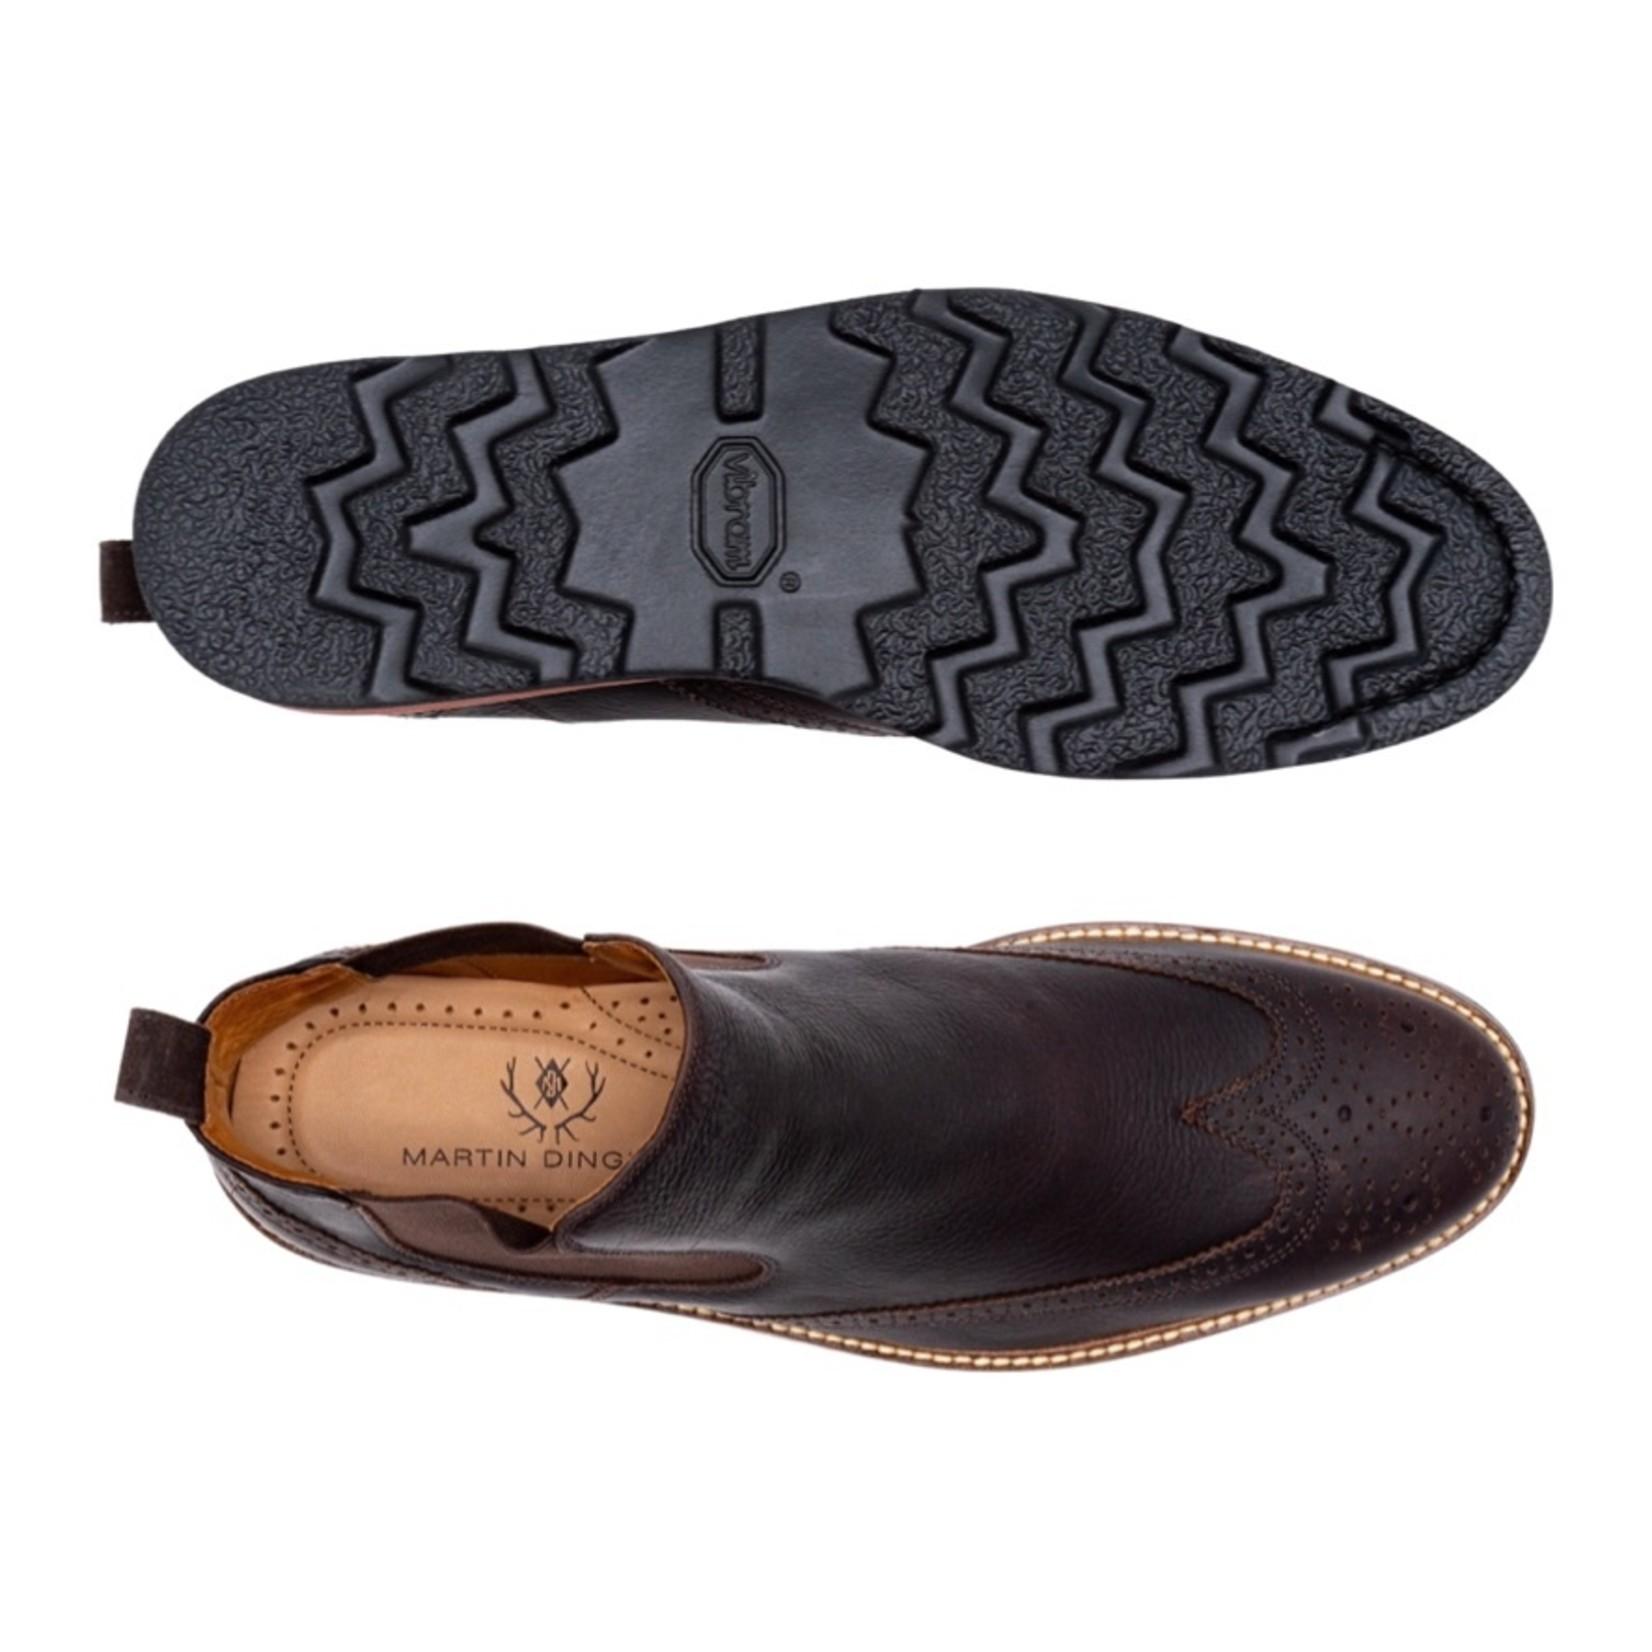 Martin Dingman Blue Ridge Chelsea Oiled Saddle Leather - Walnut